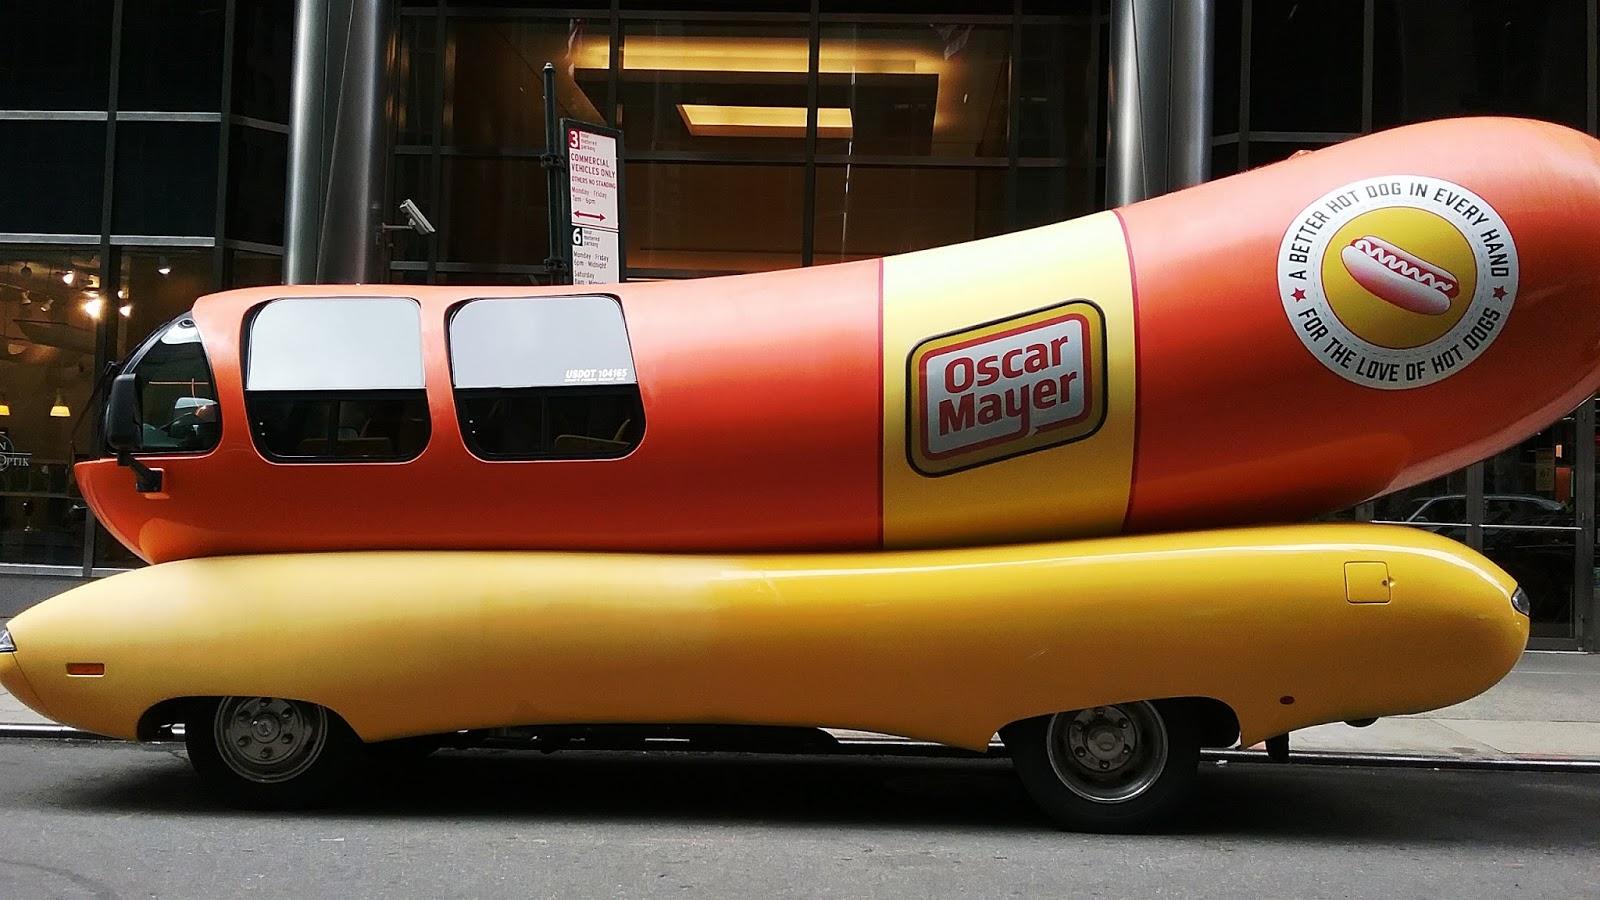 likewise Oscar Mayer Wienermobile further Oscar Mayer Wienermobile additionally 162790 Mandela Effect as well 2. on oscar mayer wienermobile clip art